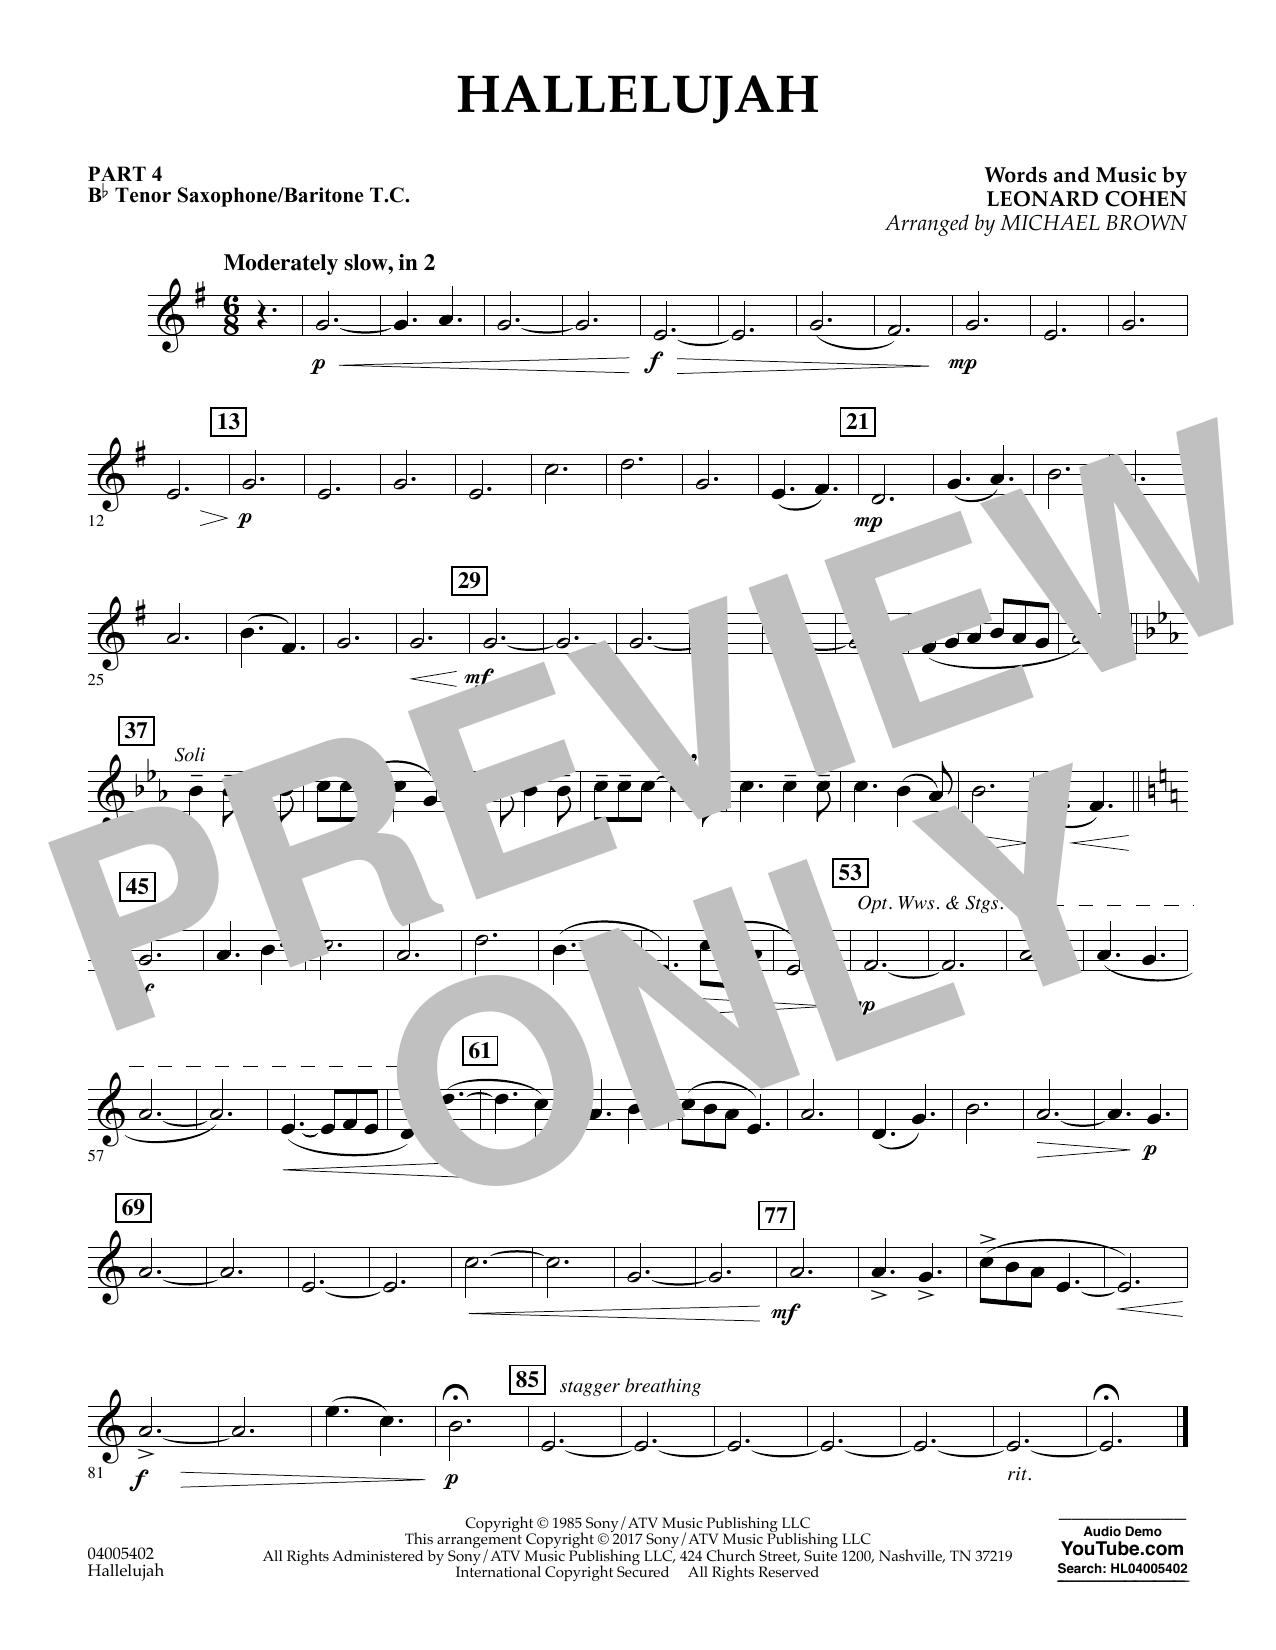 Hallelujah - Pt.4 - Bb Tenor Sax/Bar. T.C. (Flex-Band)